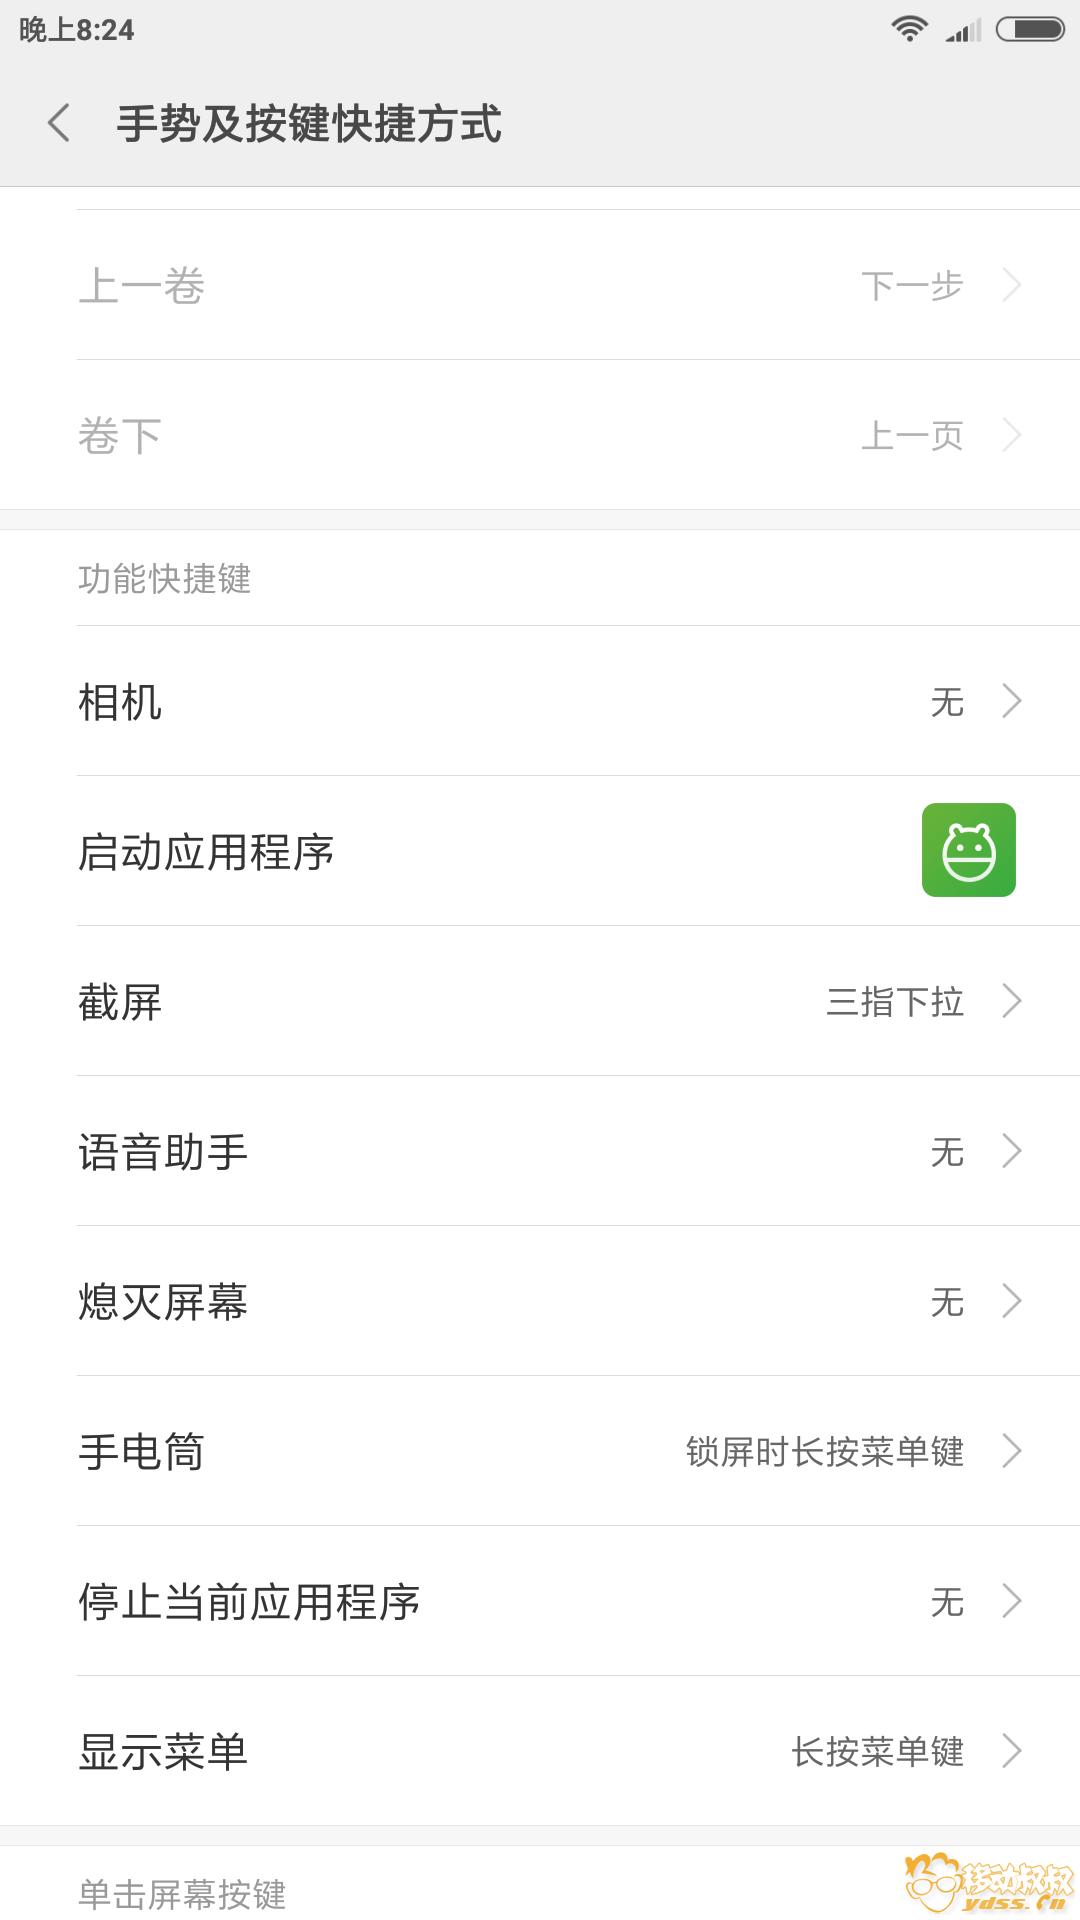 Screenshot_2018-02-28-20-24-28-341_com.android.settings.png